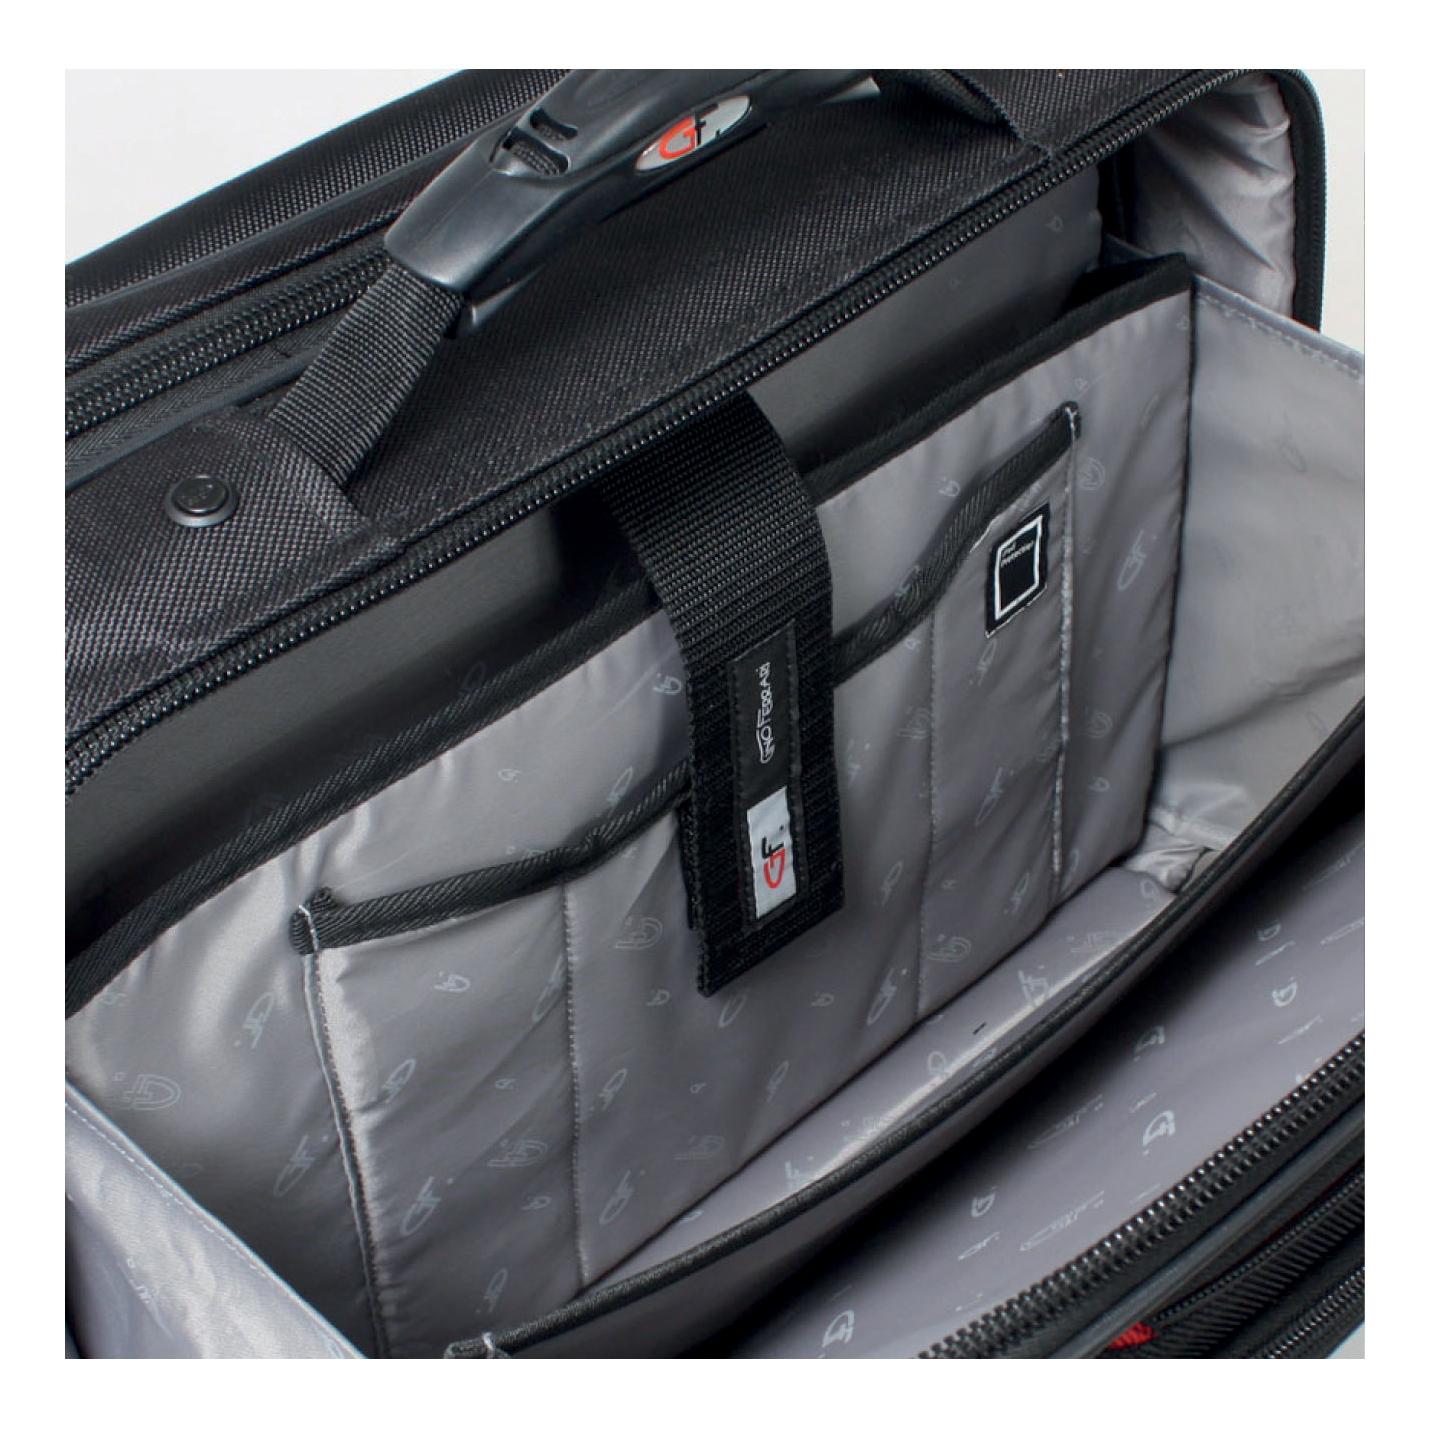 Gino Ferrari Brooklyn Business Bag Padded Wheeled On-board Size 16in Laptop Black Ref GF565